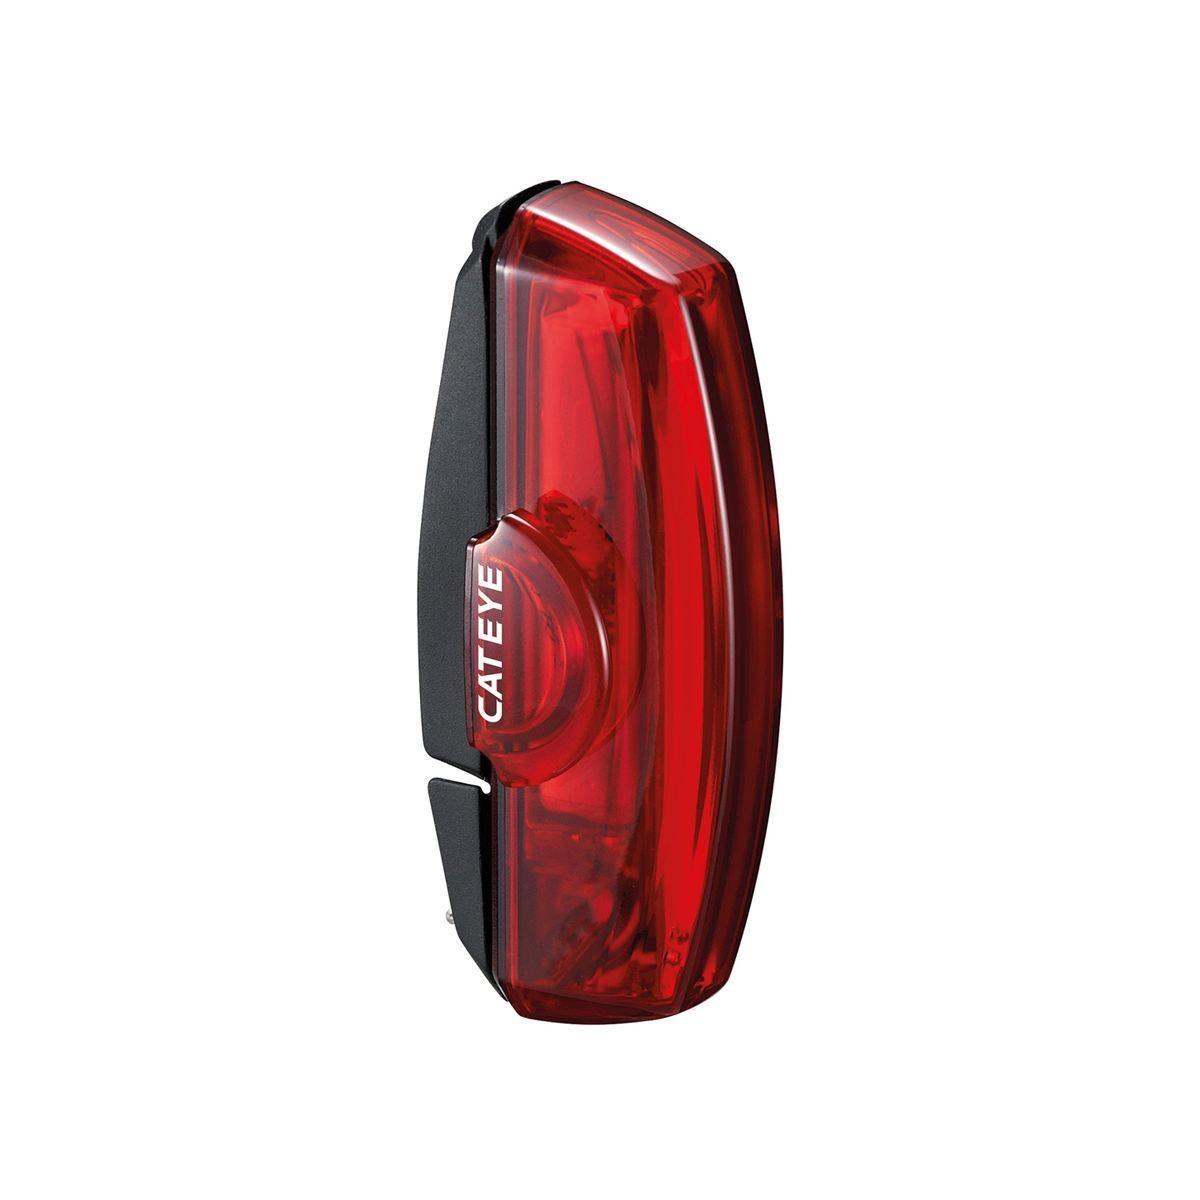 Bike Rear Light USB Rechargeable  Cateye Rapid X3 150 Lumen LED Tail Lamp  cheapest price